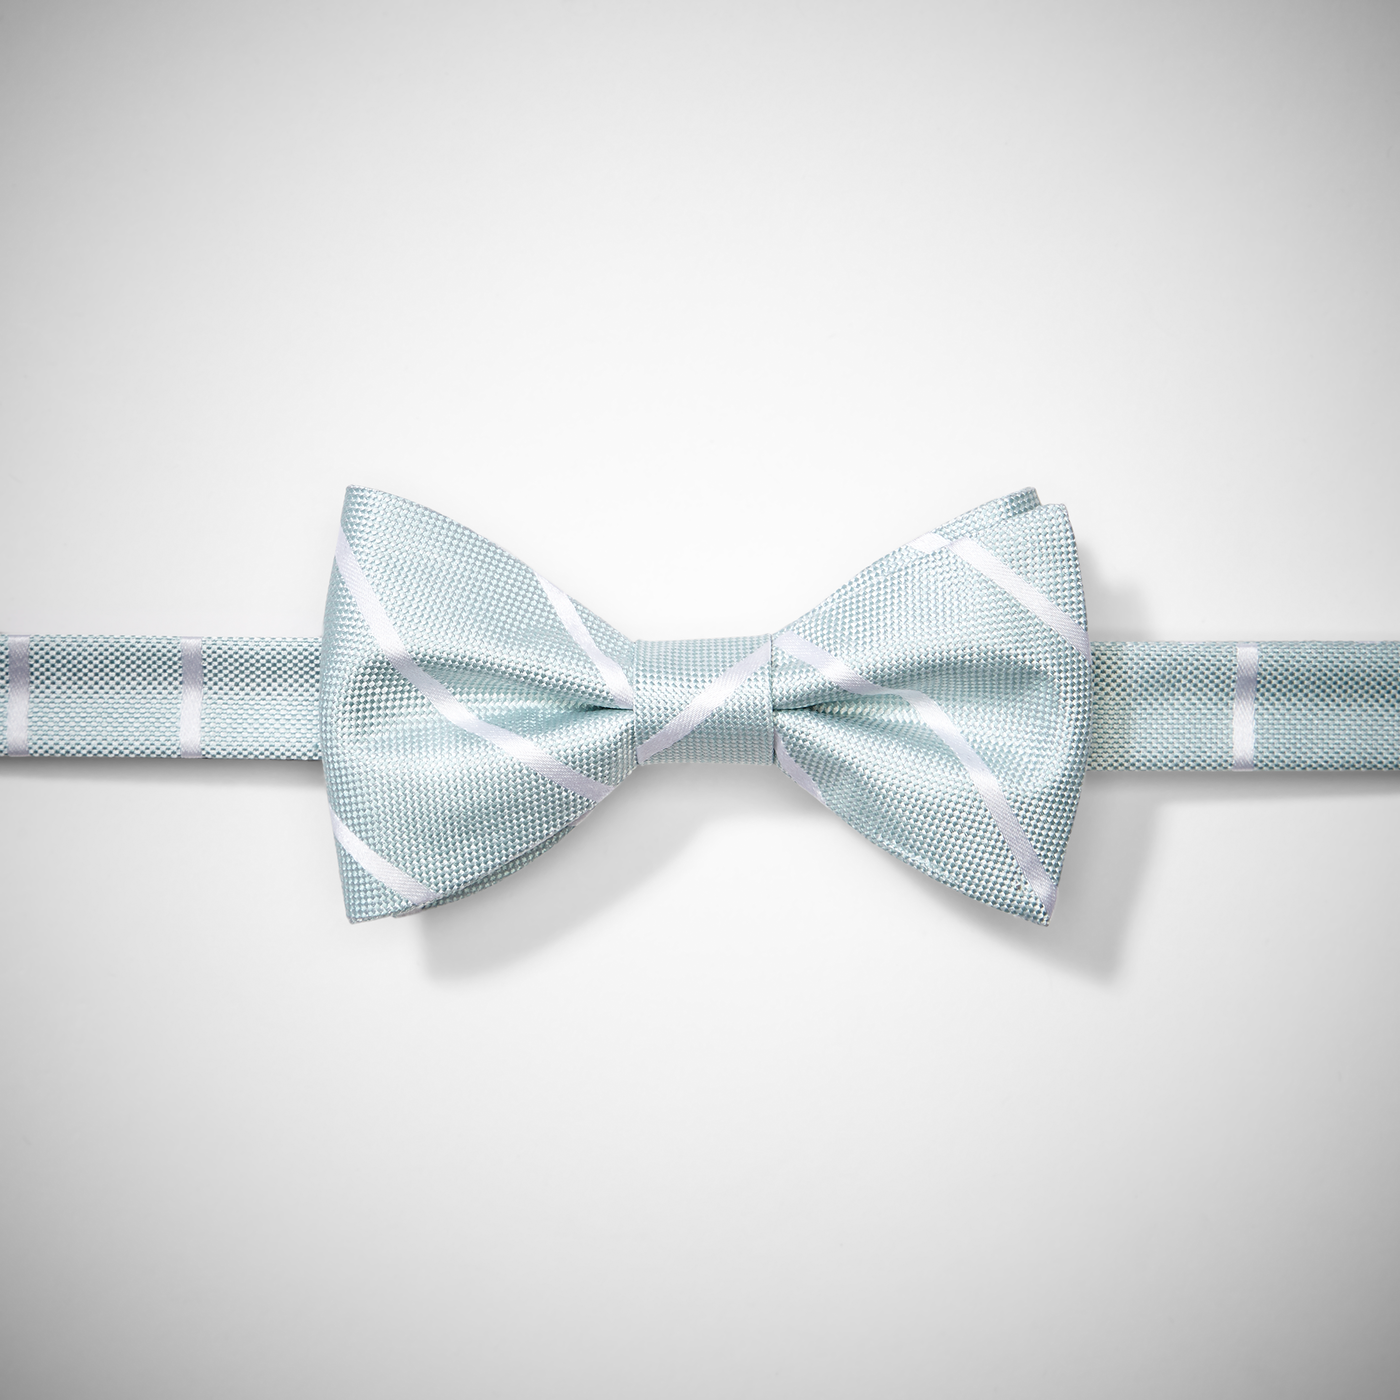 Mint Thin Stripe Pre-Tied Bow Tie